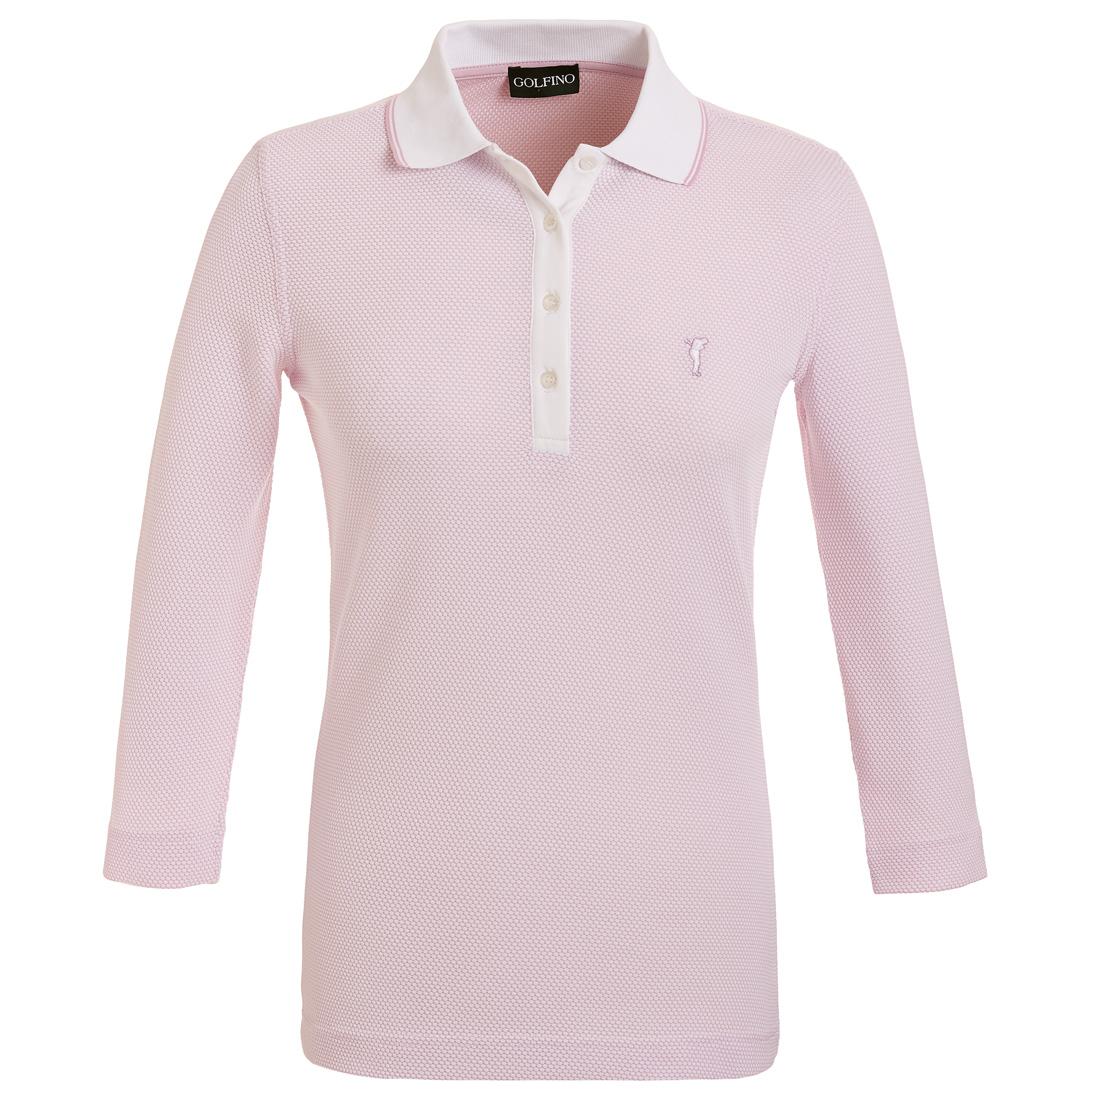 3/4-Arm Funktions-Golfpoloshirt in Regular Fit aus feinem Bubble Jacquard